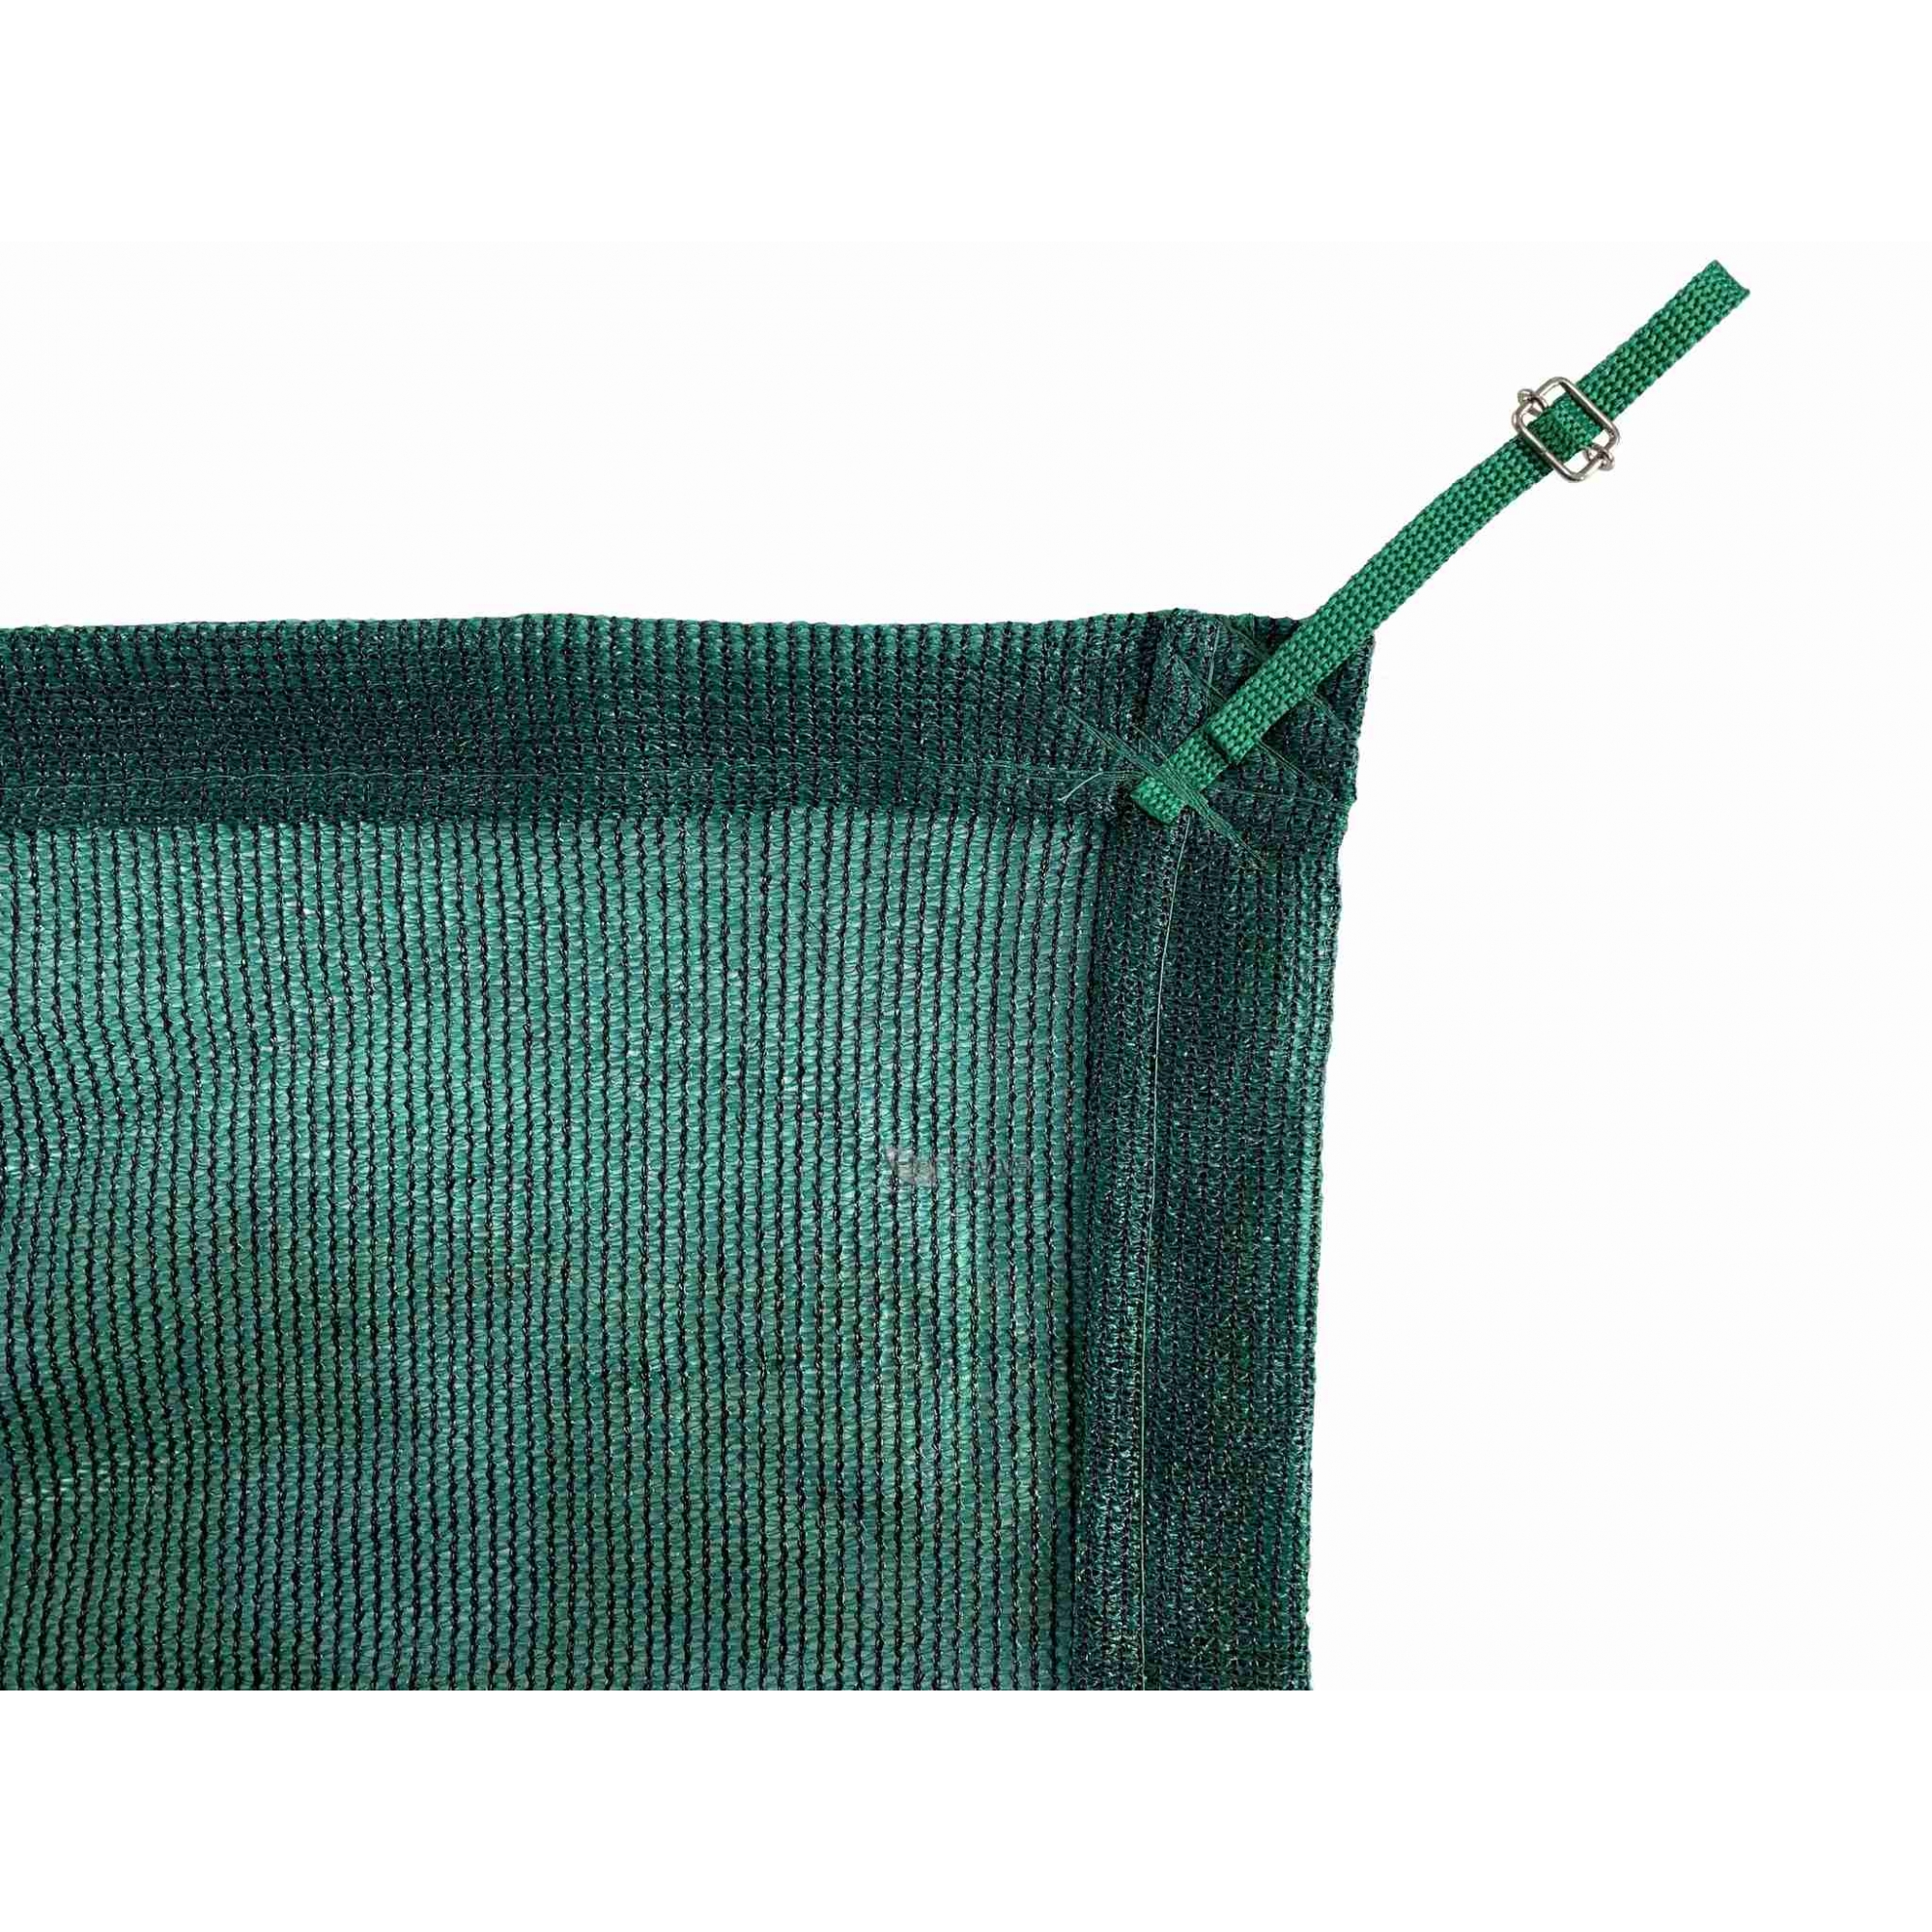 Tela de Sombreamento 80% Verde com Esticadores - Largura: 1,5 Metros